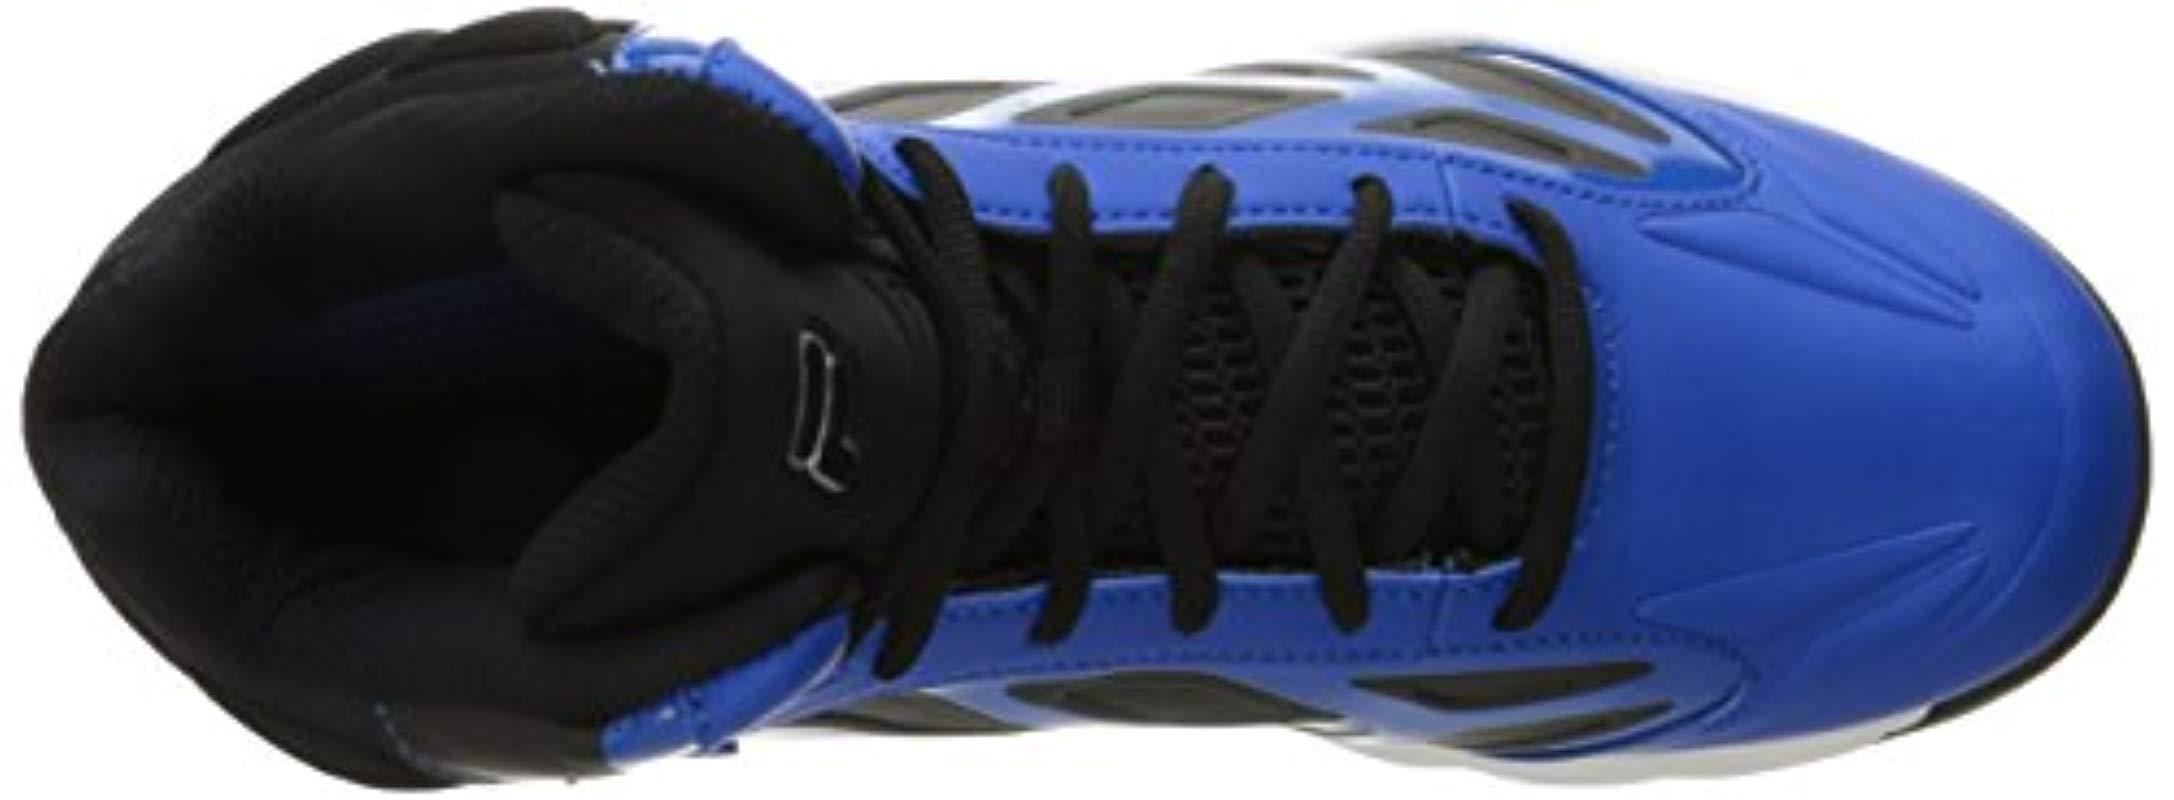 Fila Leather Torranado Basketball Shoe